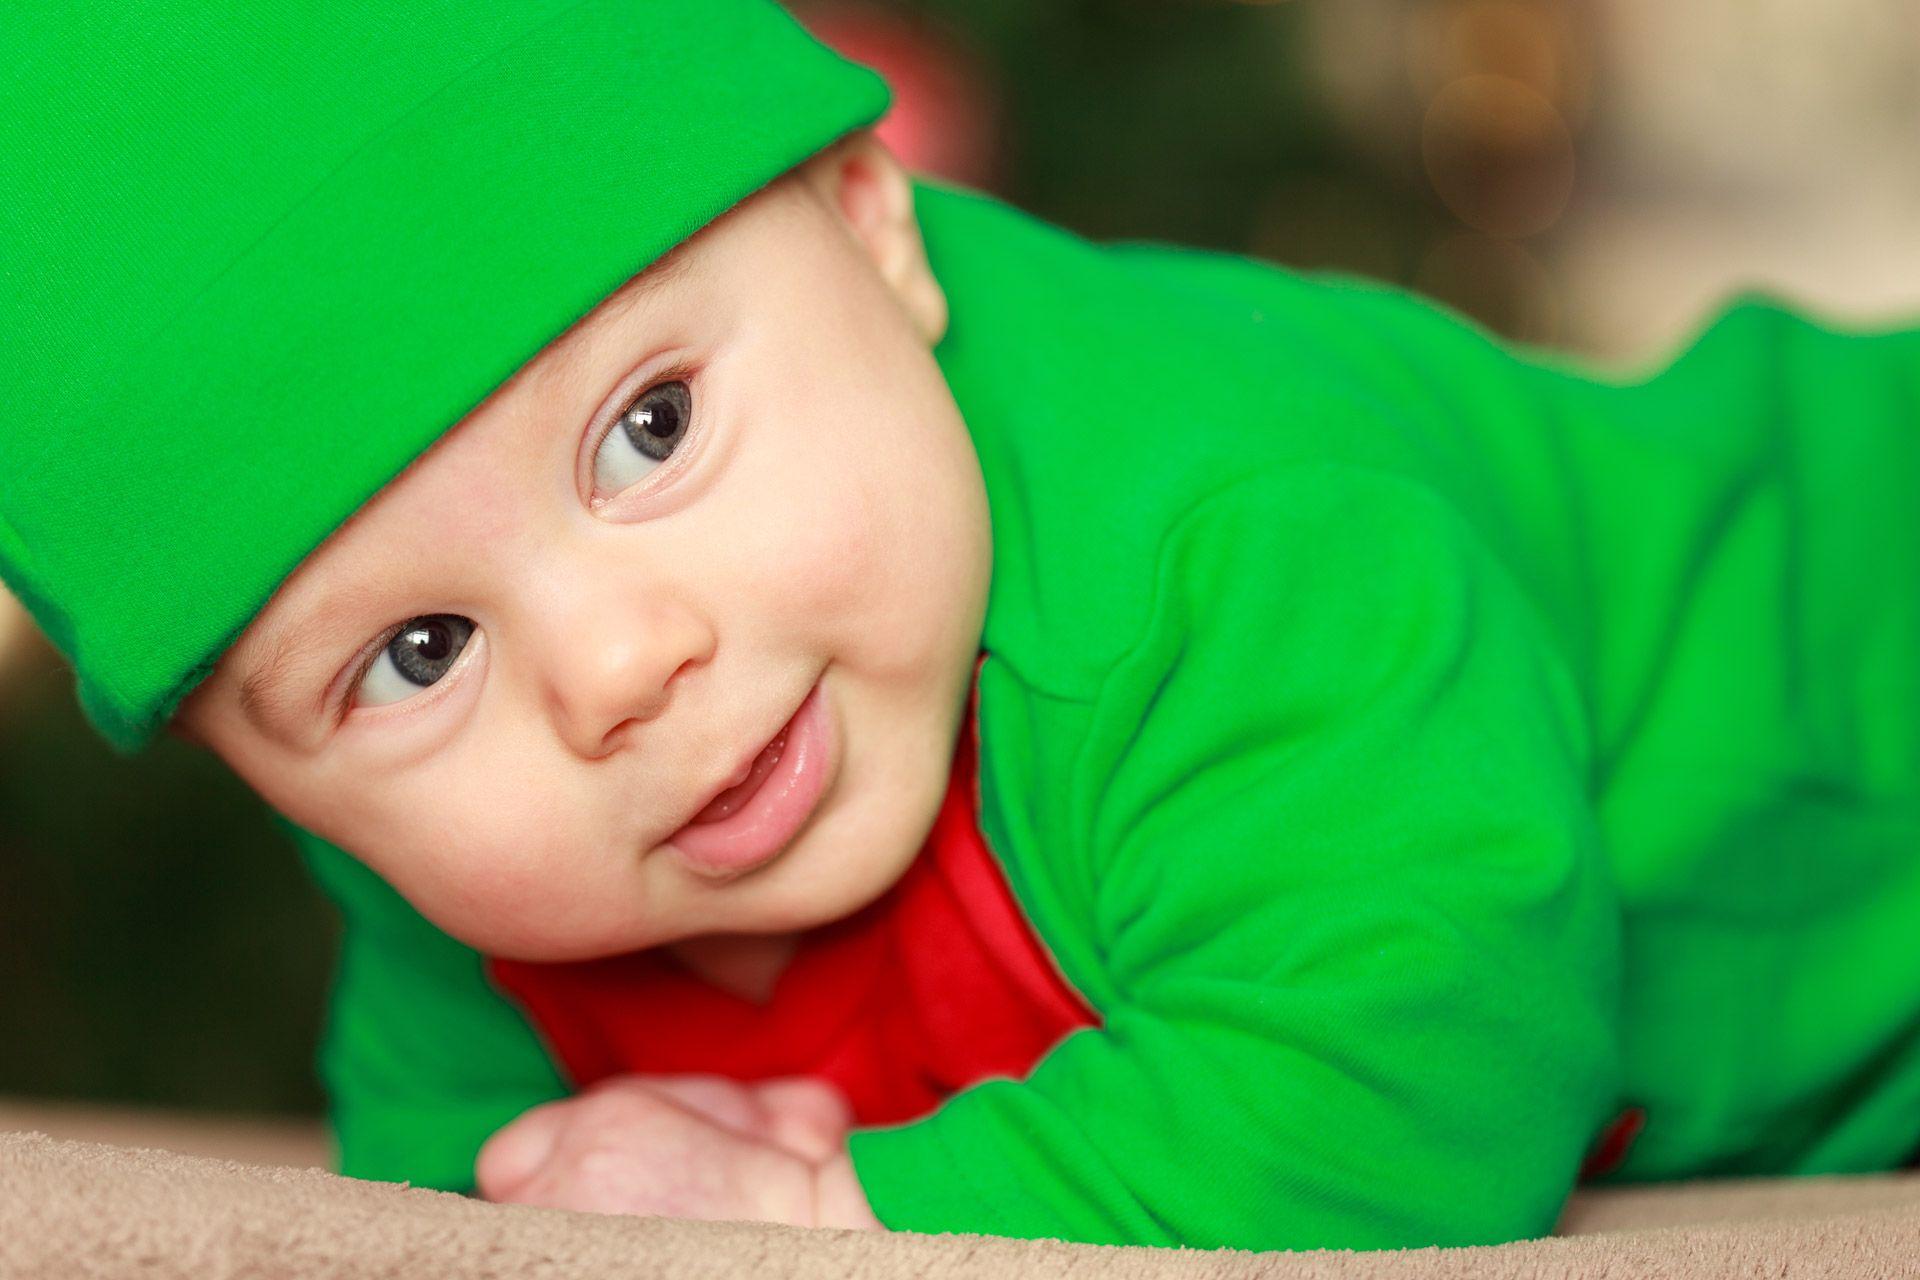 Cute Little Boy HD Wallpaper Cute Baby, HD, Wallpapers, Sweet, Babies, Boy , Girl, Photos, Picture, Latest, 1080p